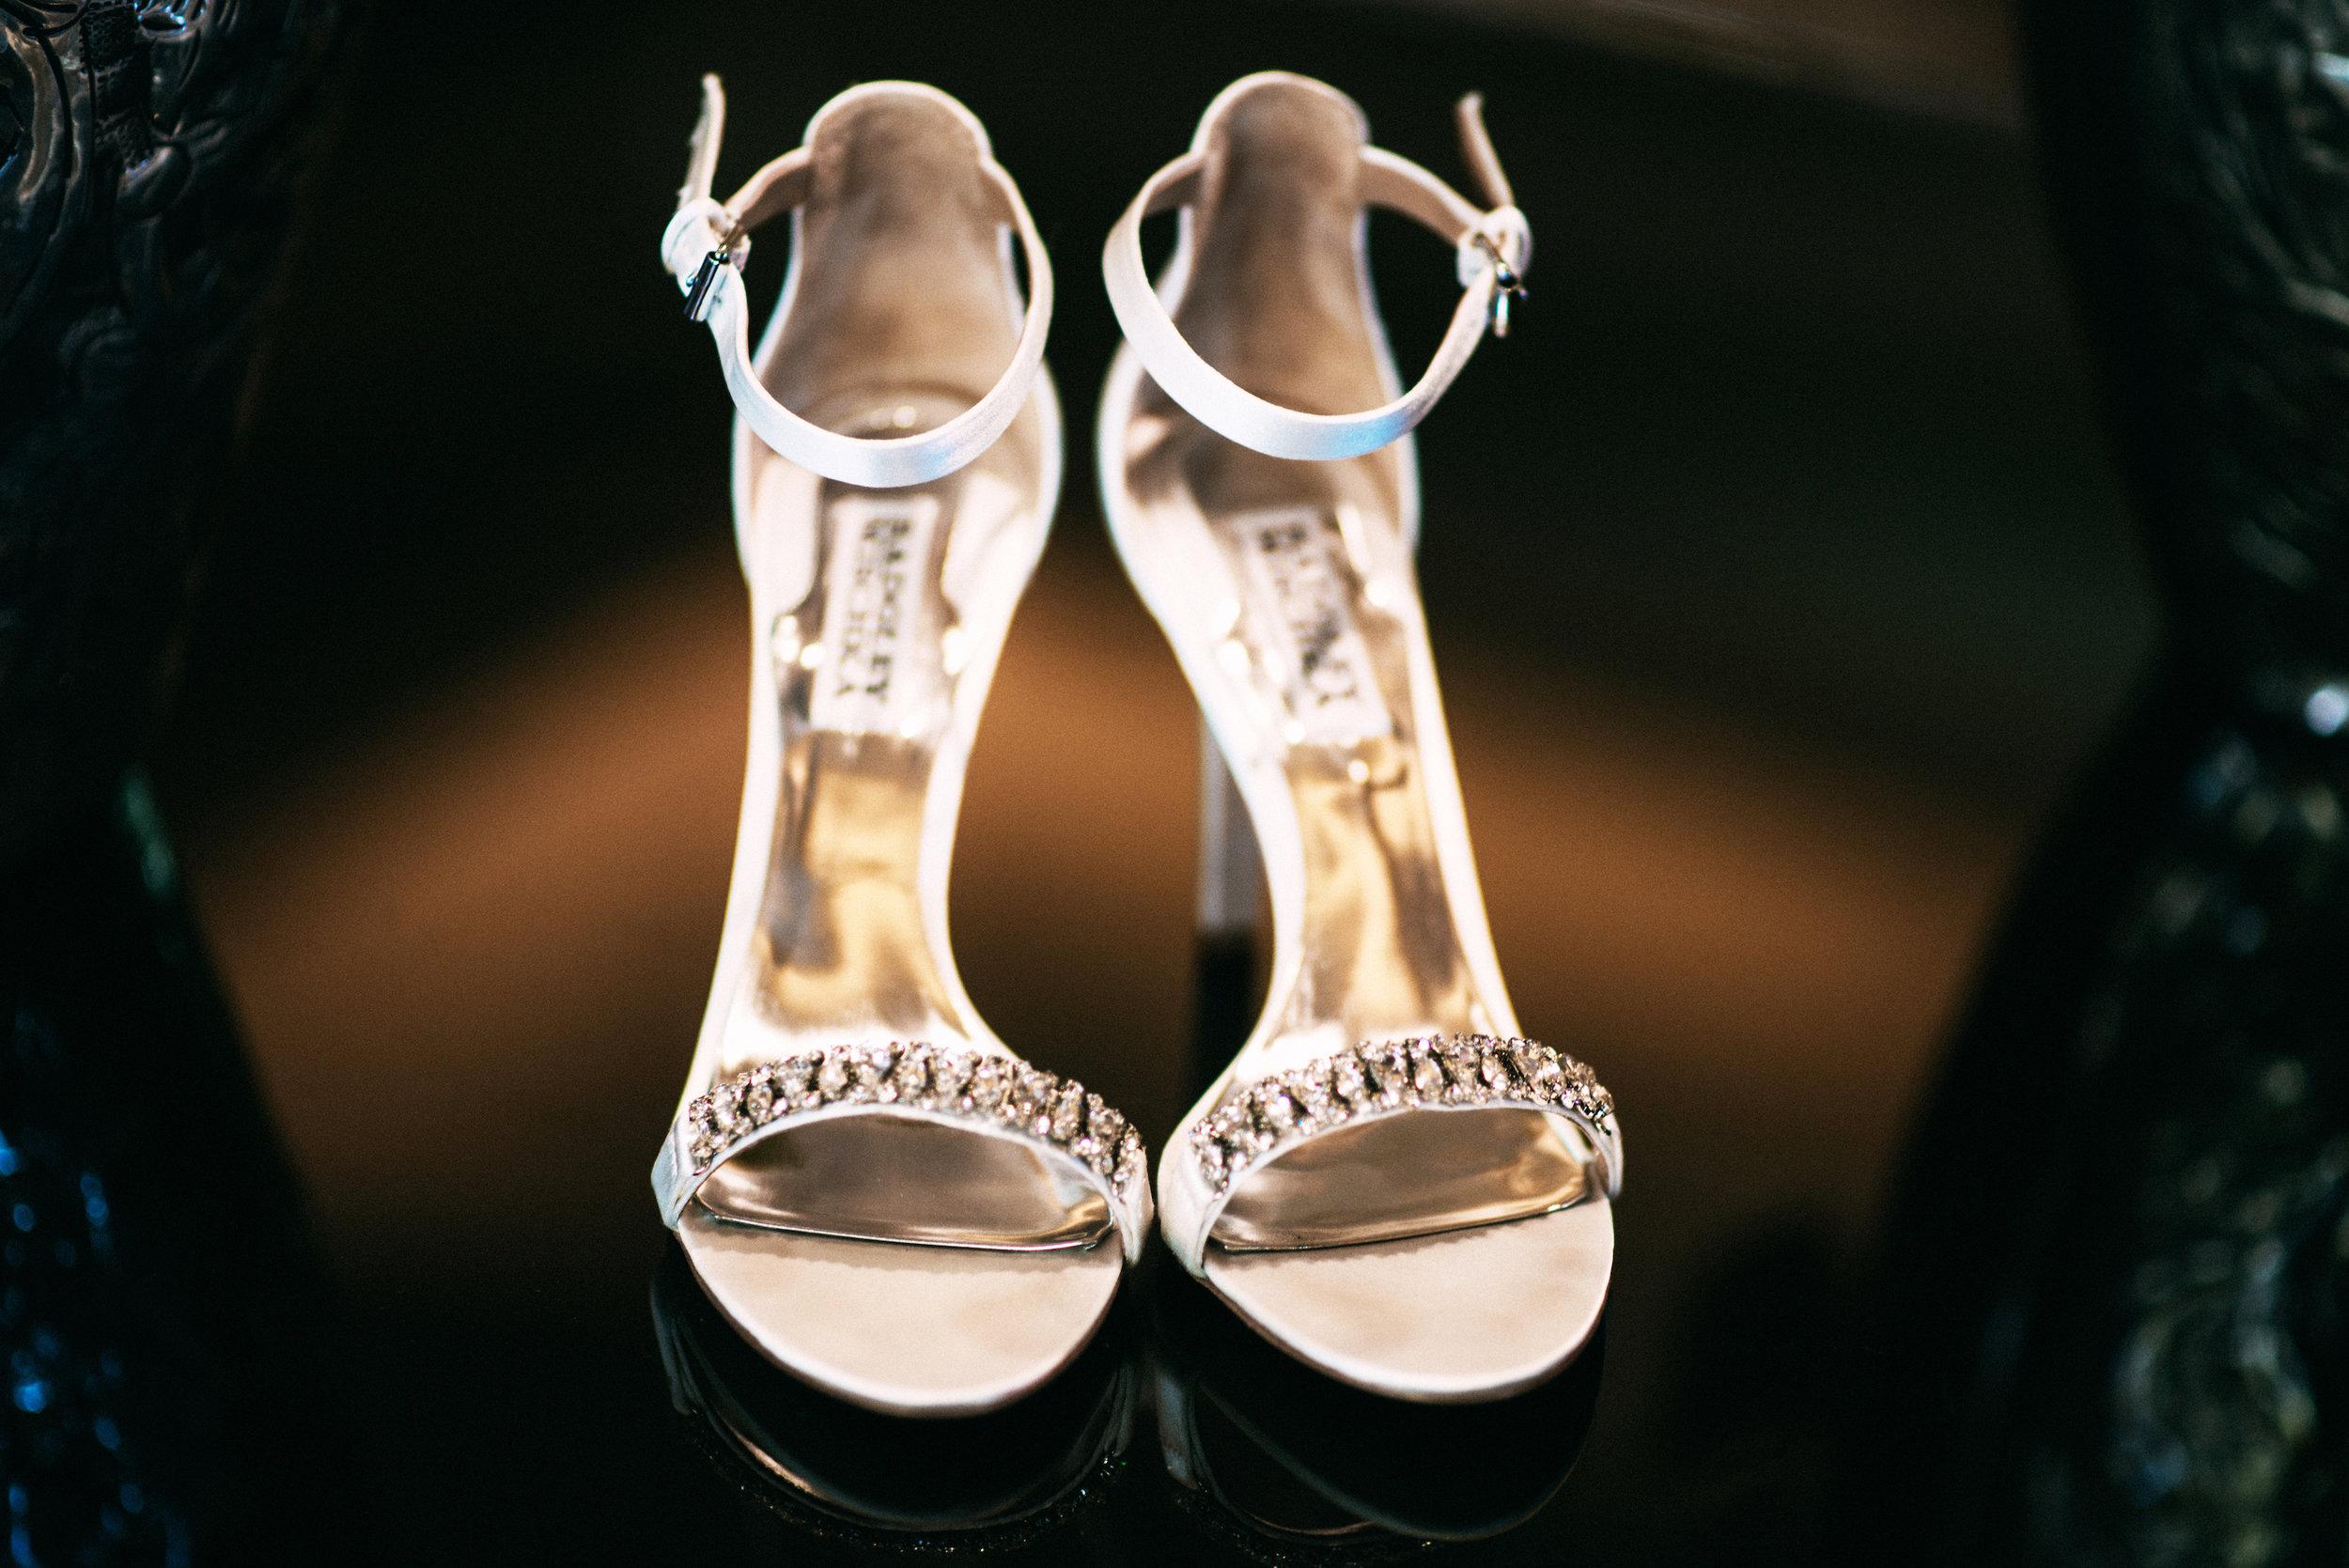 007 Shoes.jpg